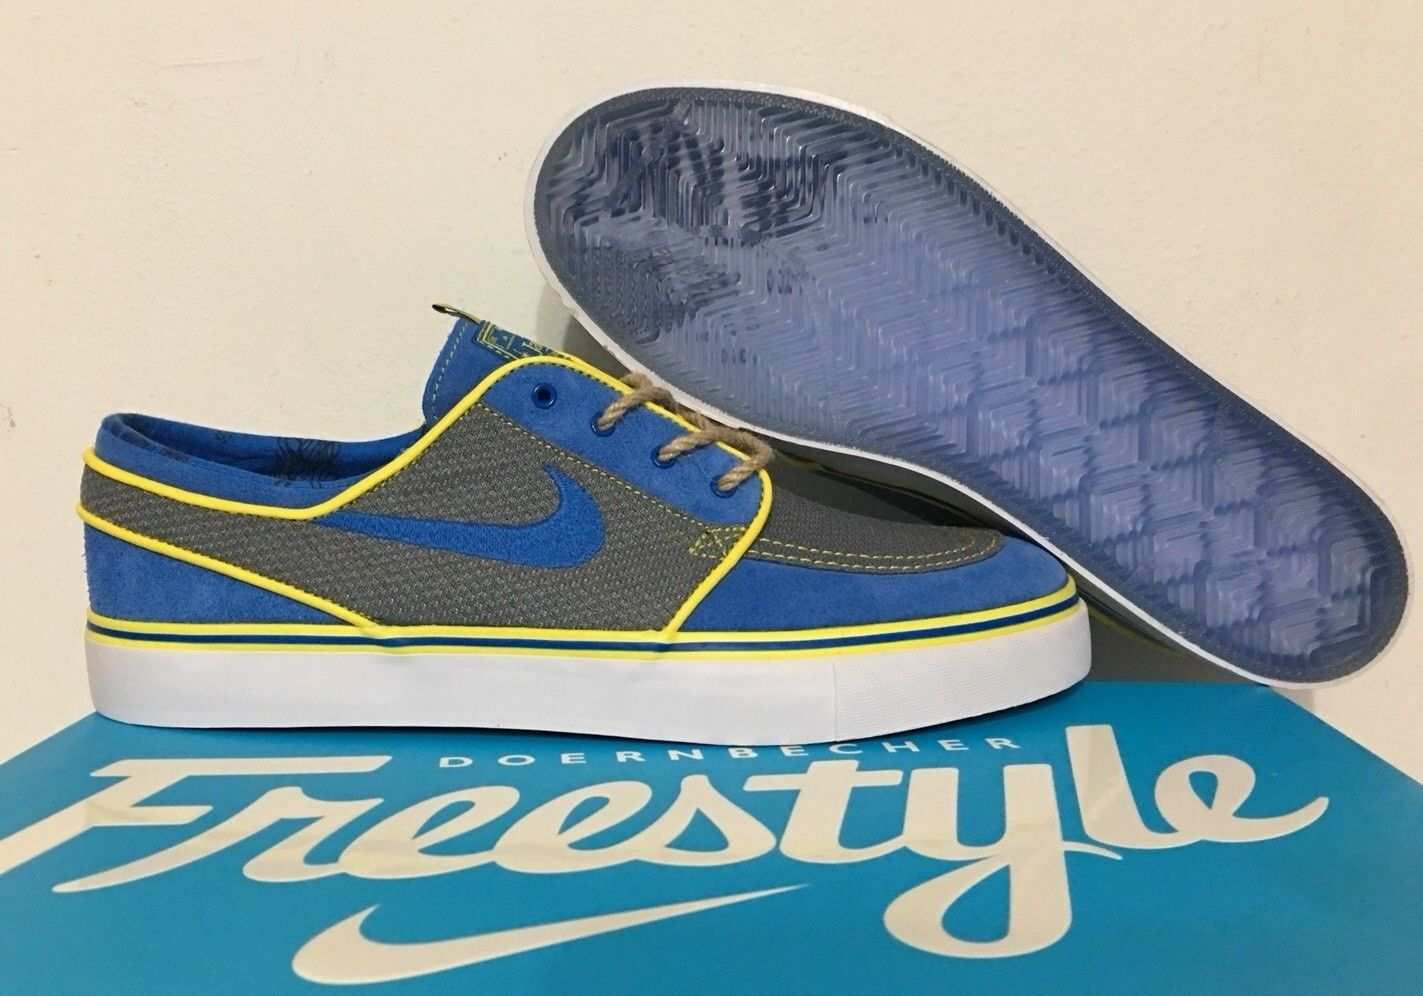 Nike Zoom Stephan Janowski DB Doernbecher  Tylan Hibbard   Blue SZ 10 AH7188-470